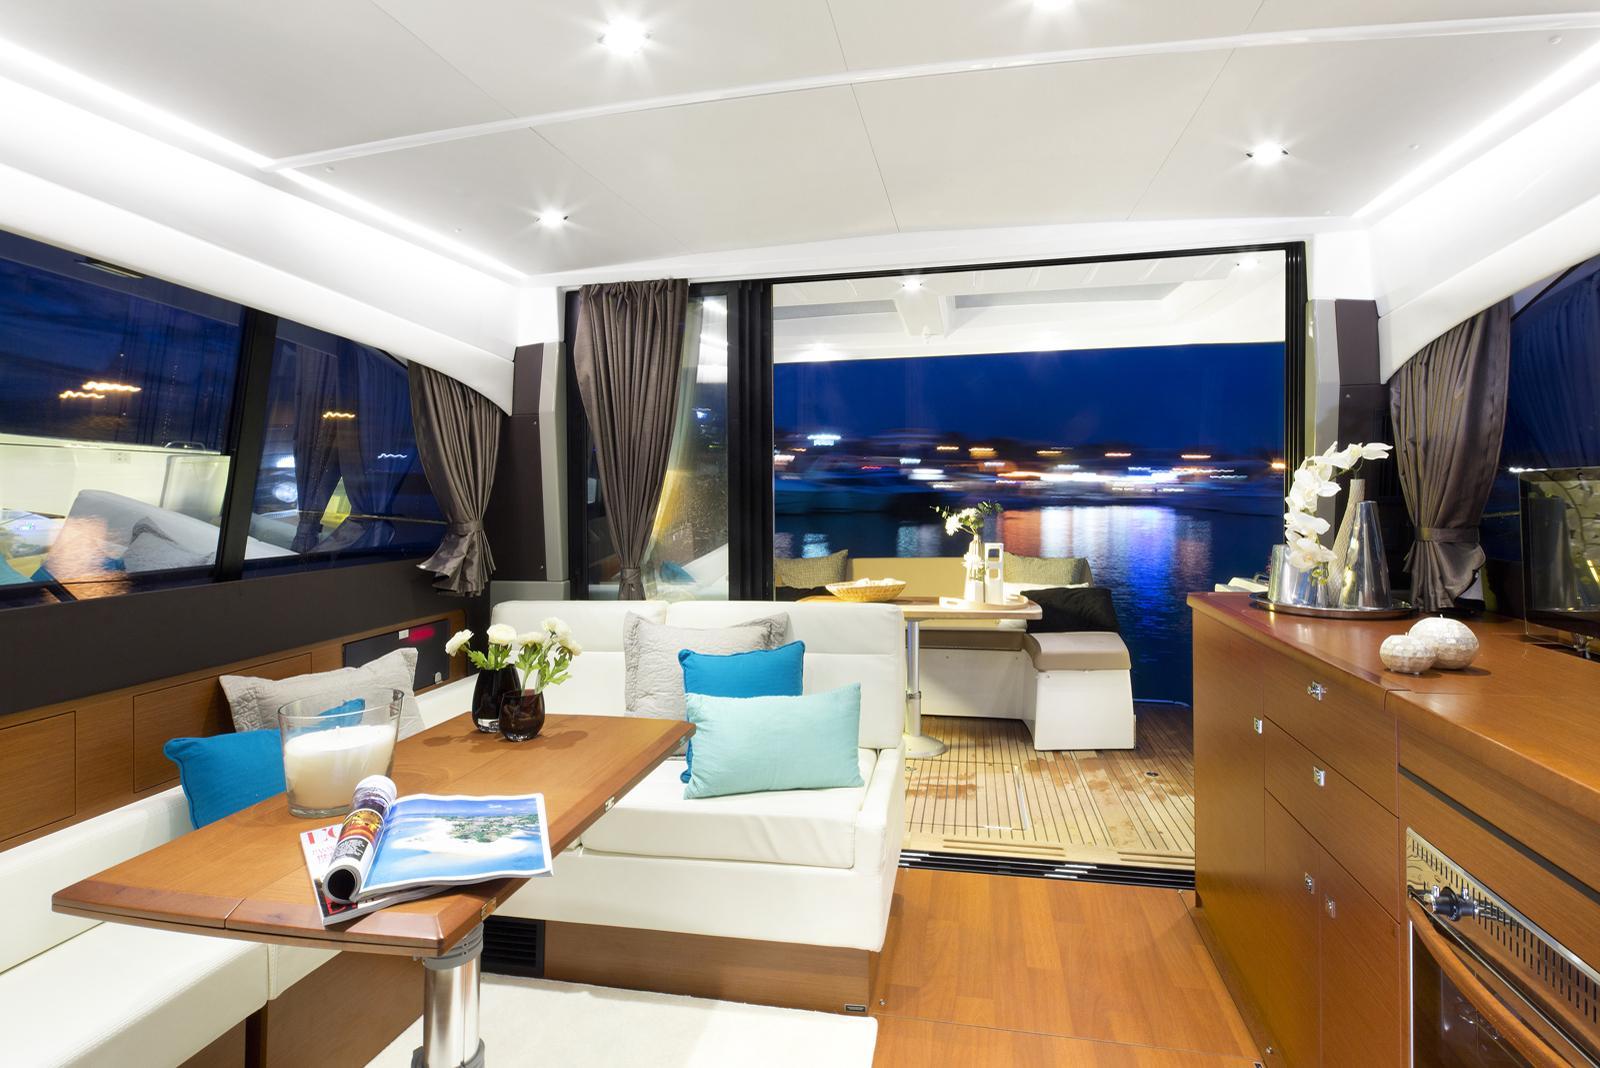 Jeanneau NC 14 Yacht in Halong bay (interrior)